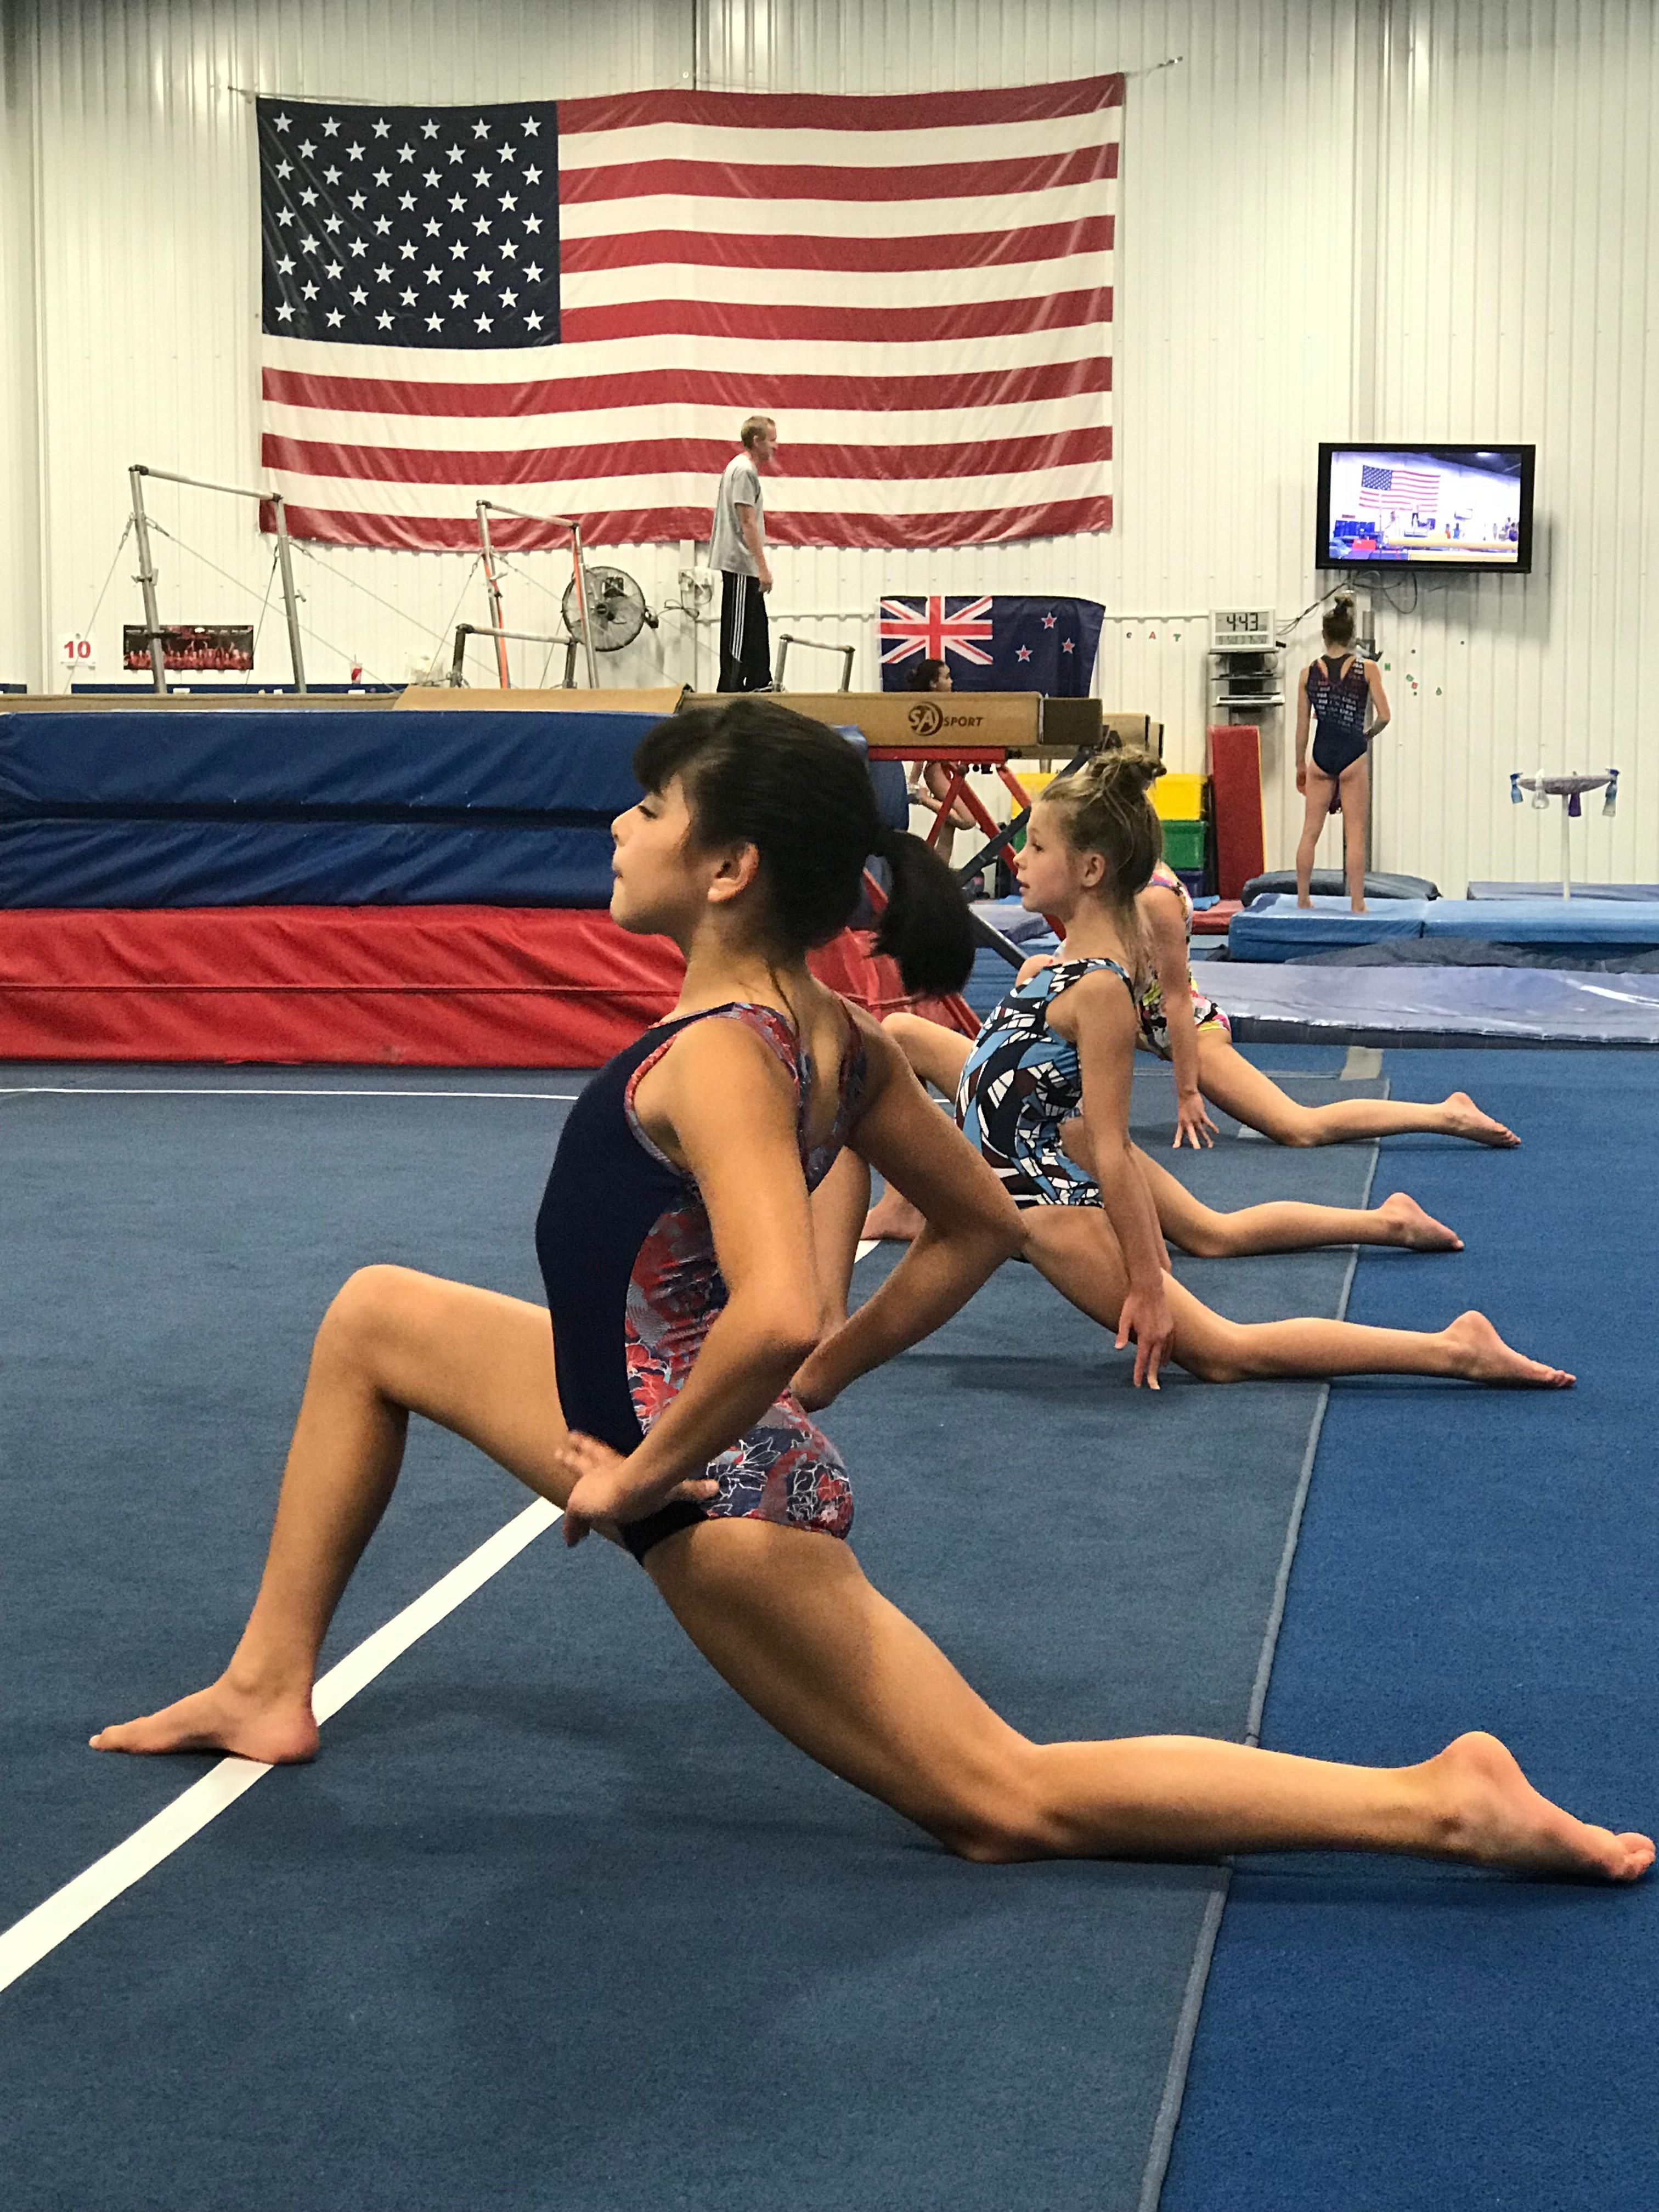 Texas East Gymnastics image 3